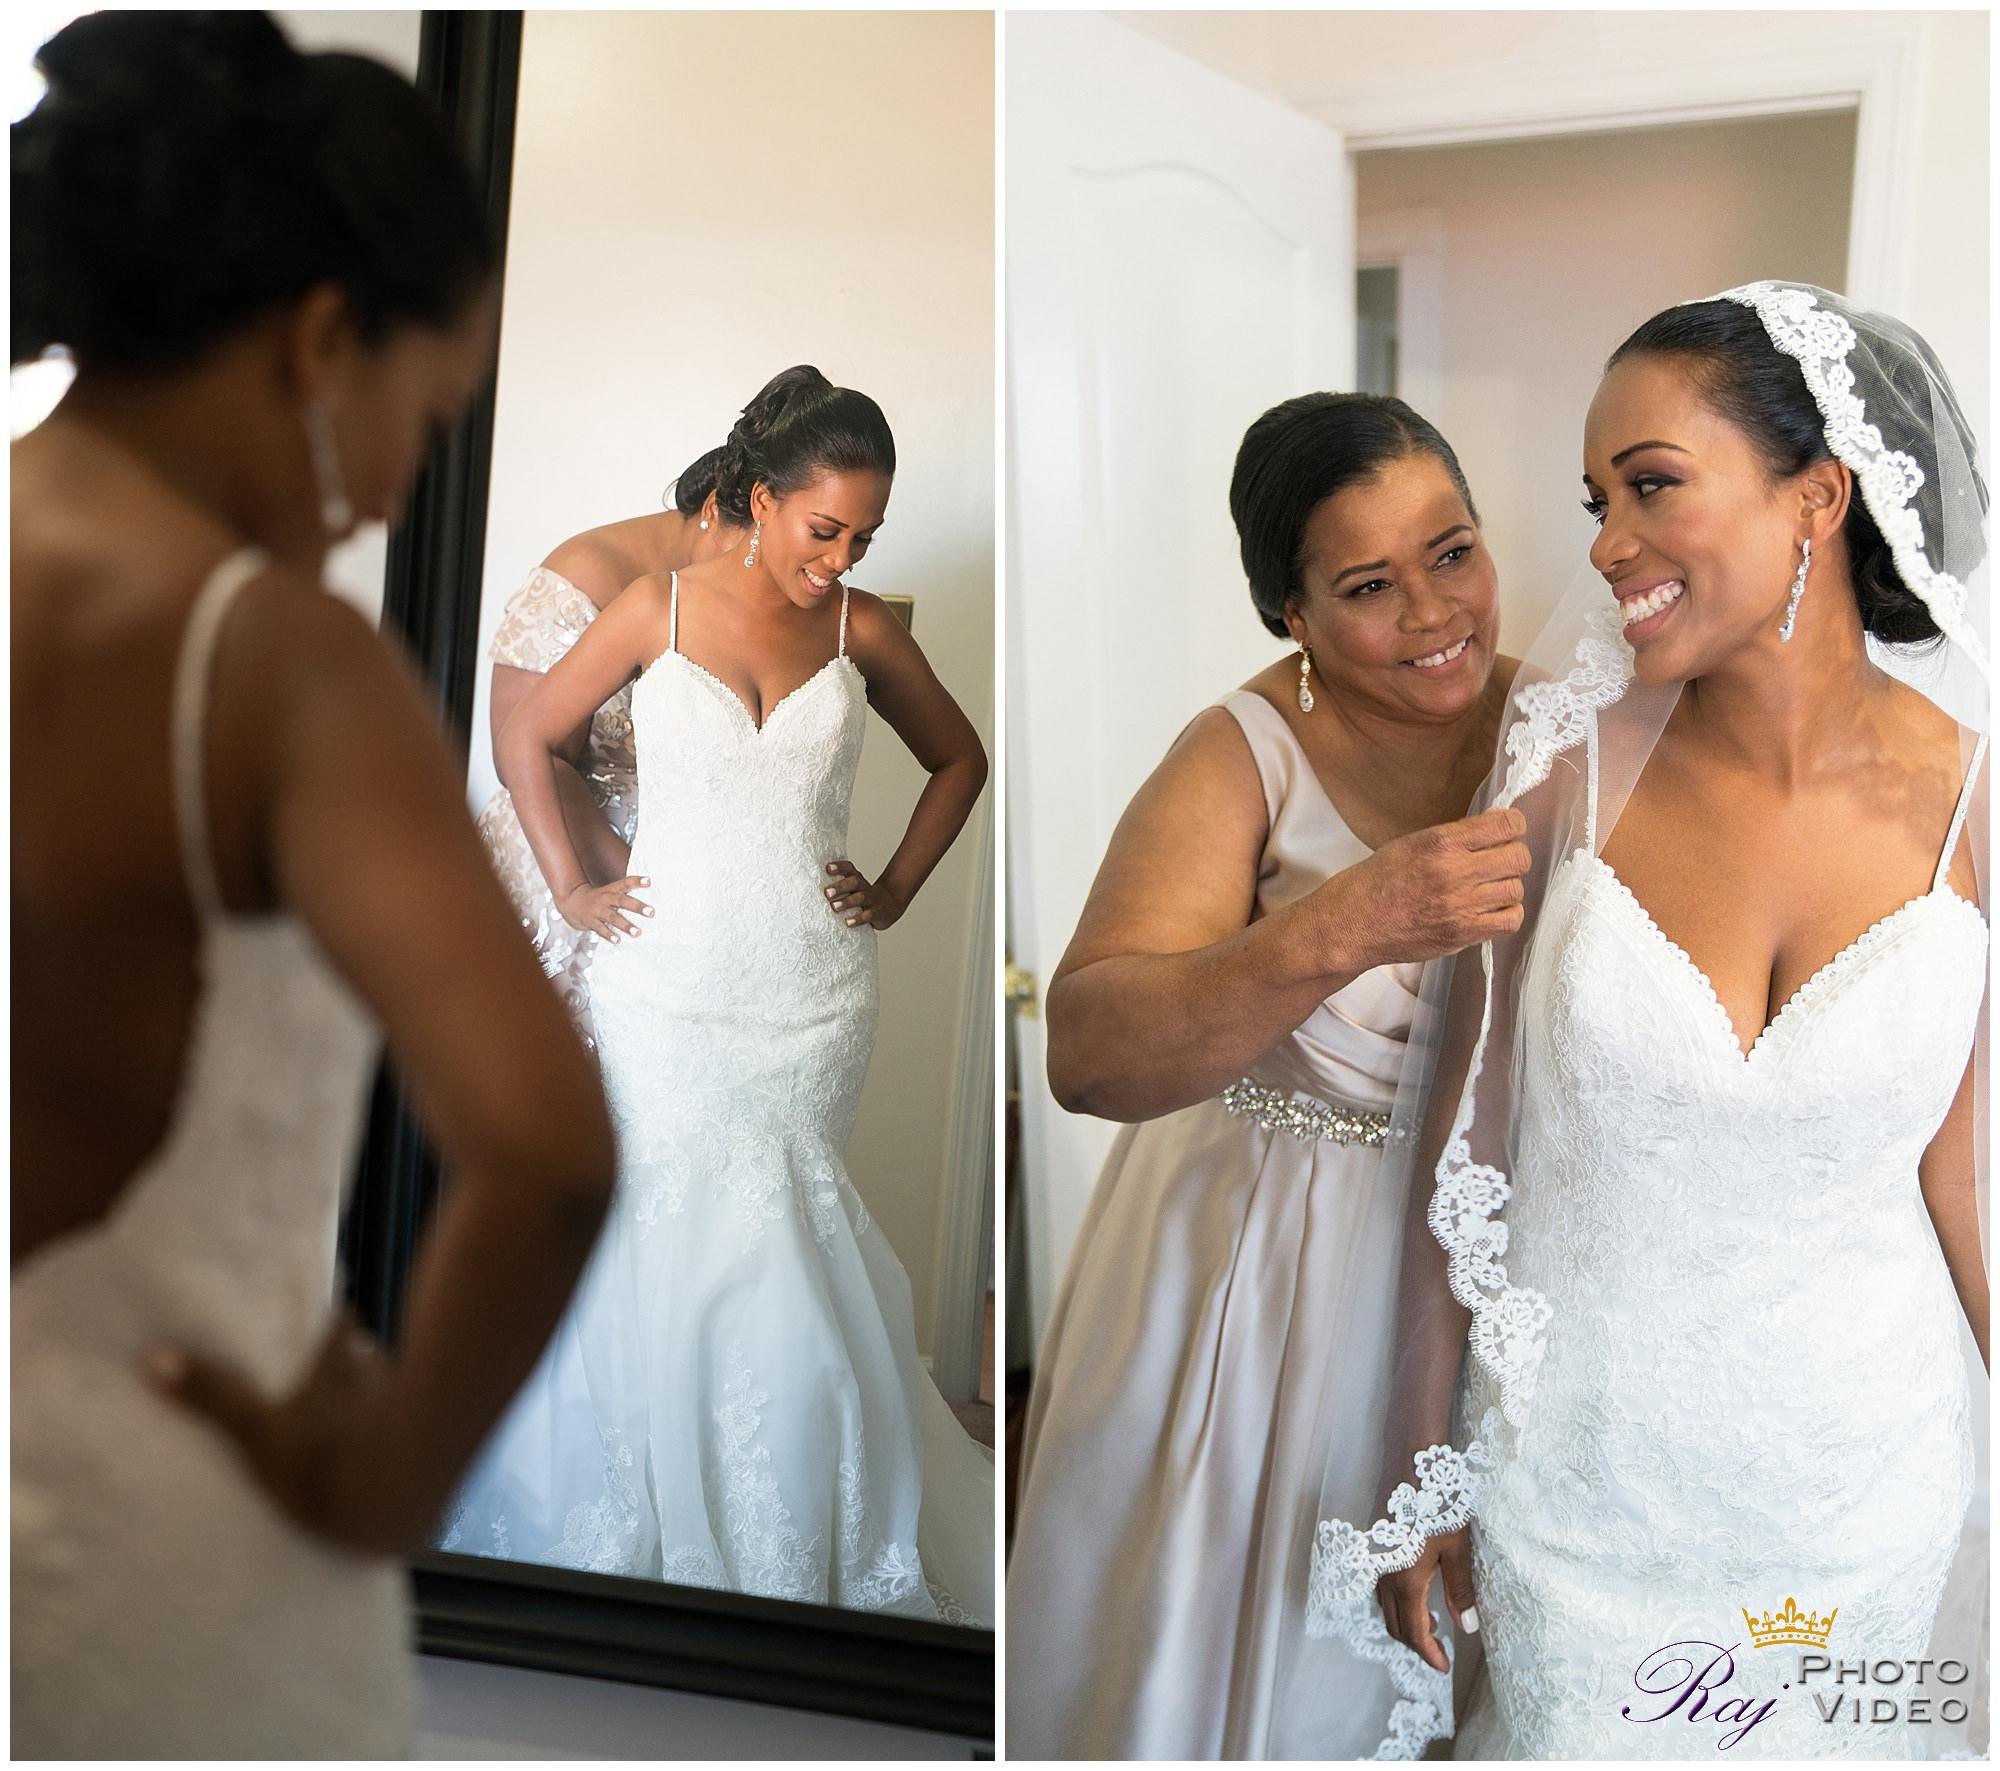 The-Armory-Perth-Amboy-NJ-Catholic-Wedding-Yudelkis-Stephen-5.jpg